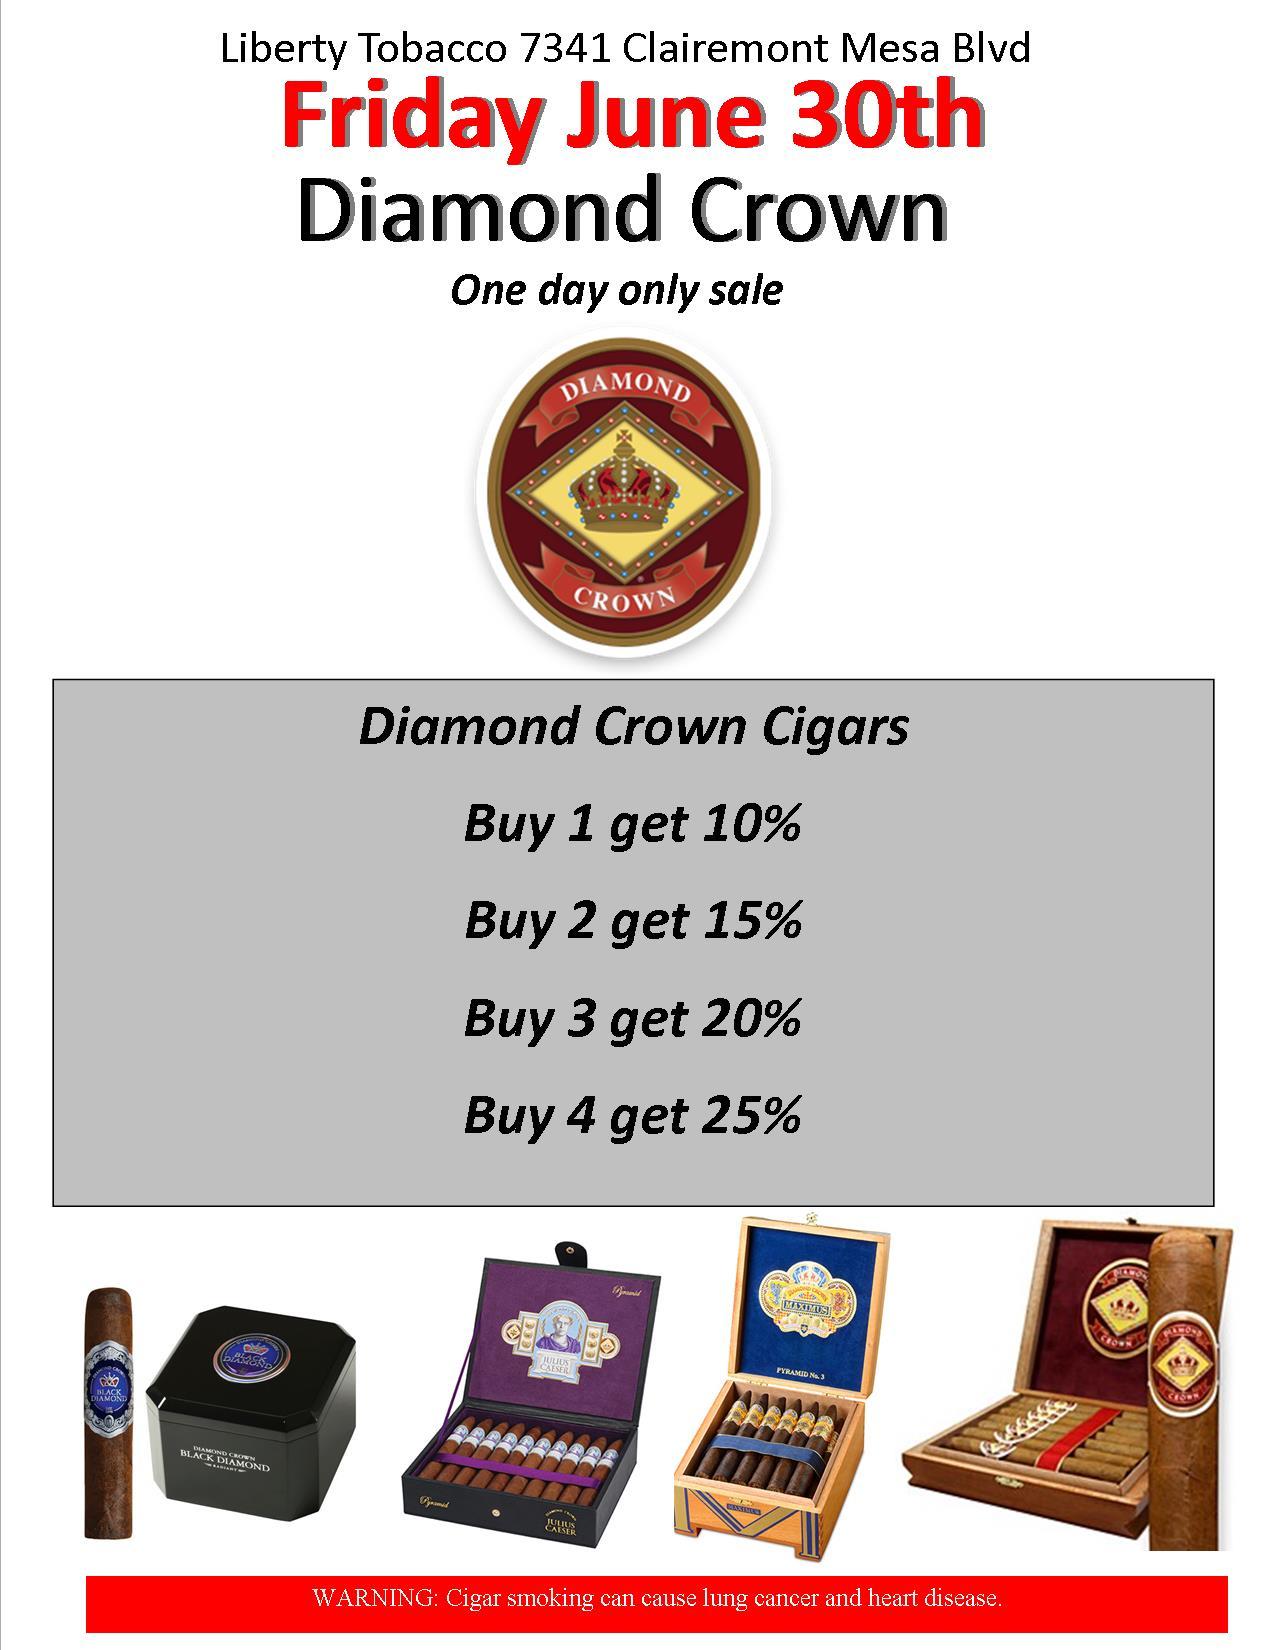 Diamond Crown One Day Sale at Liberty Tobacco Kearny Mesa